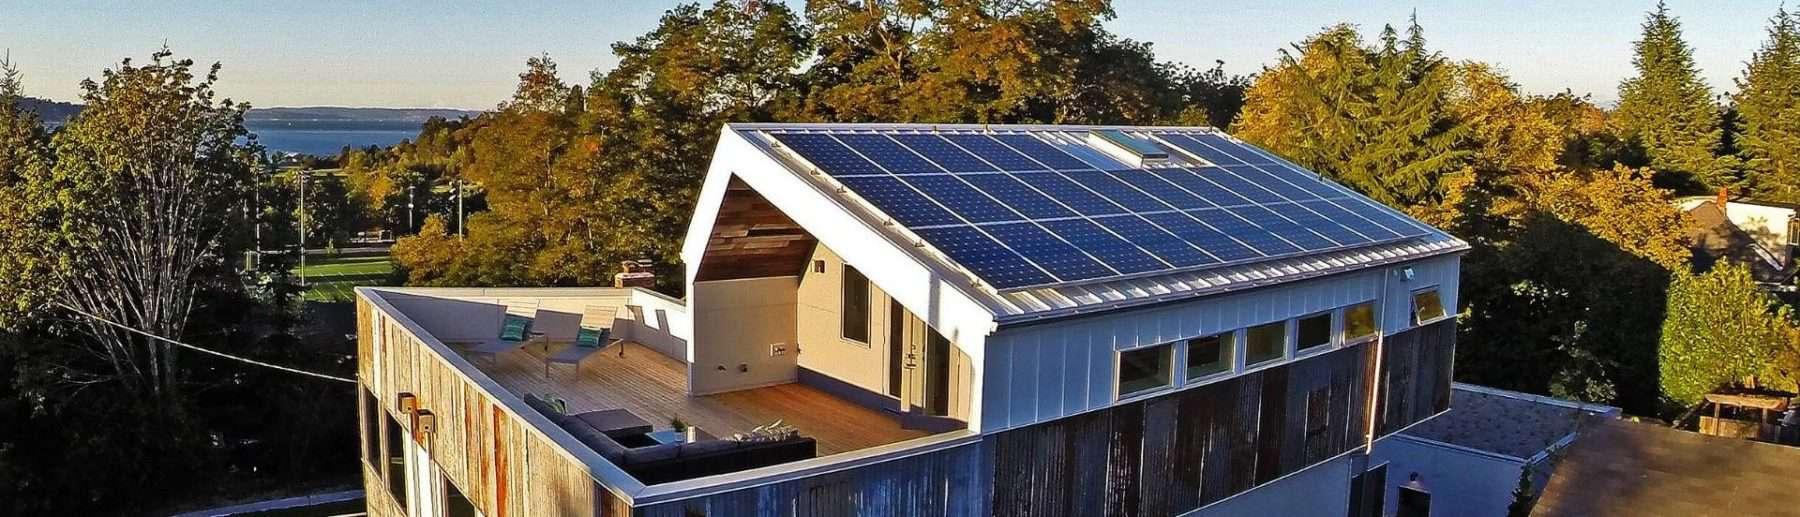 fotovoltaico per casa